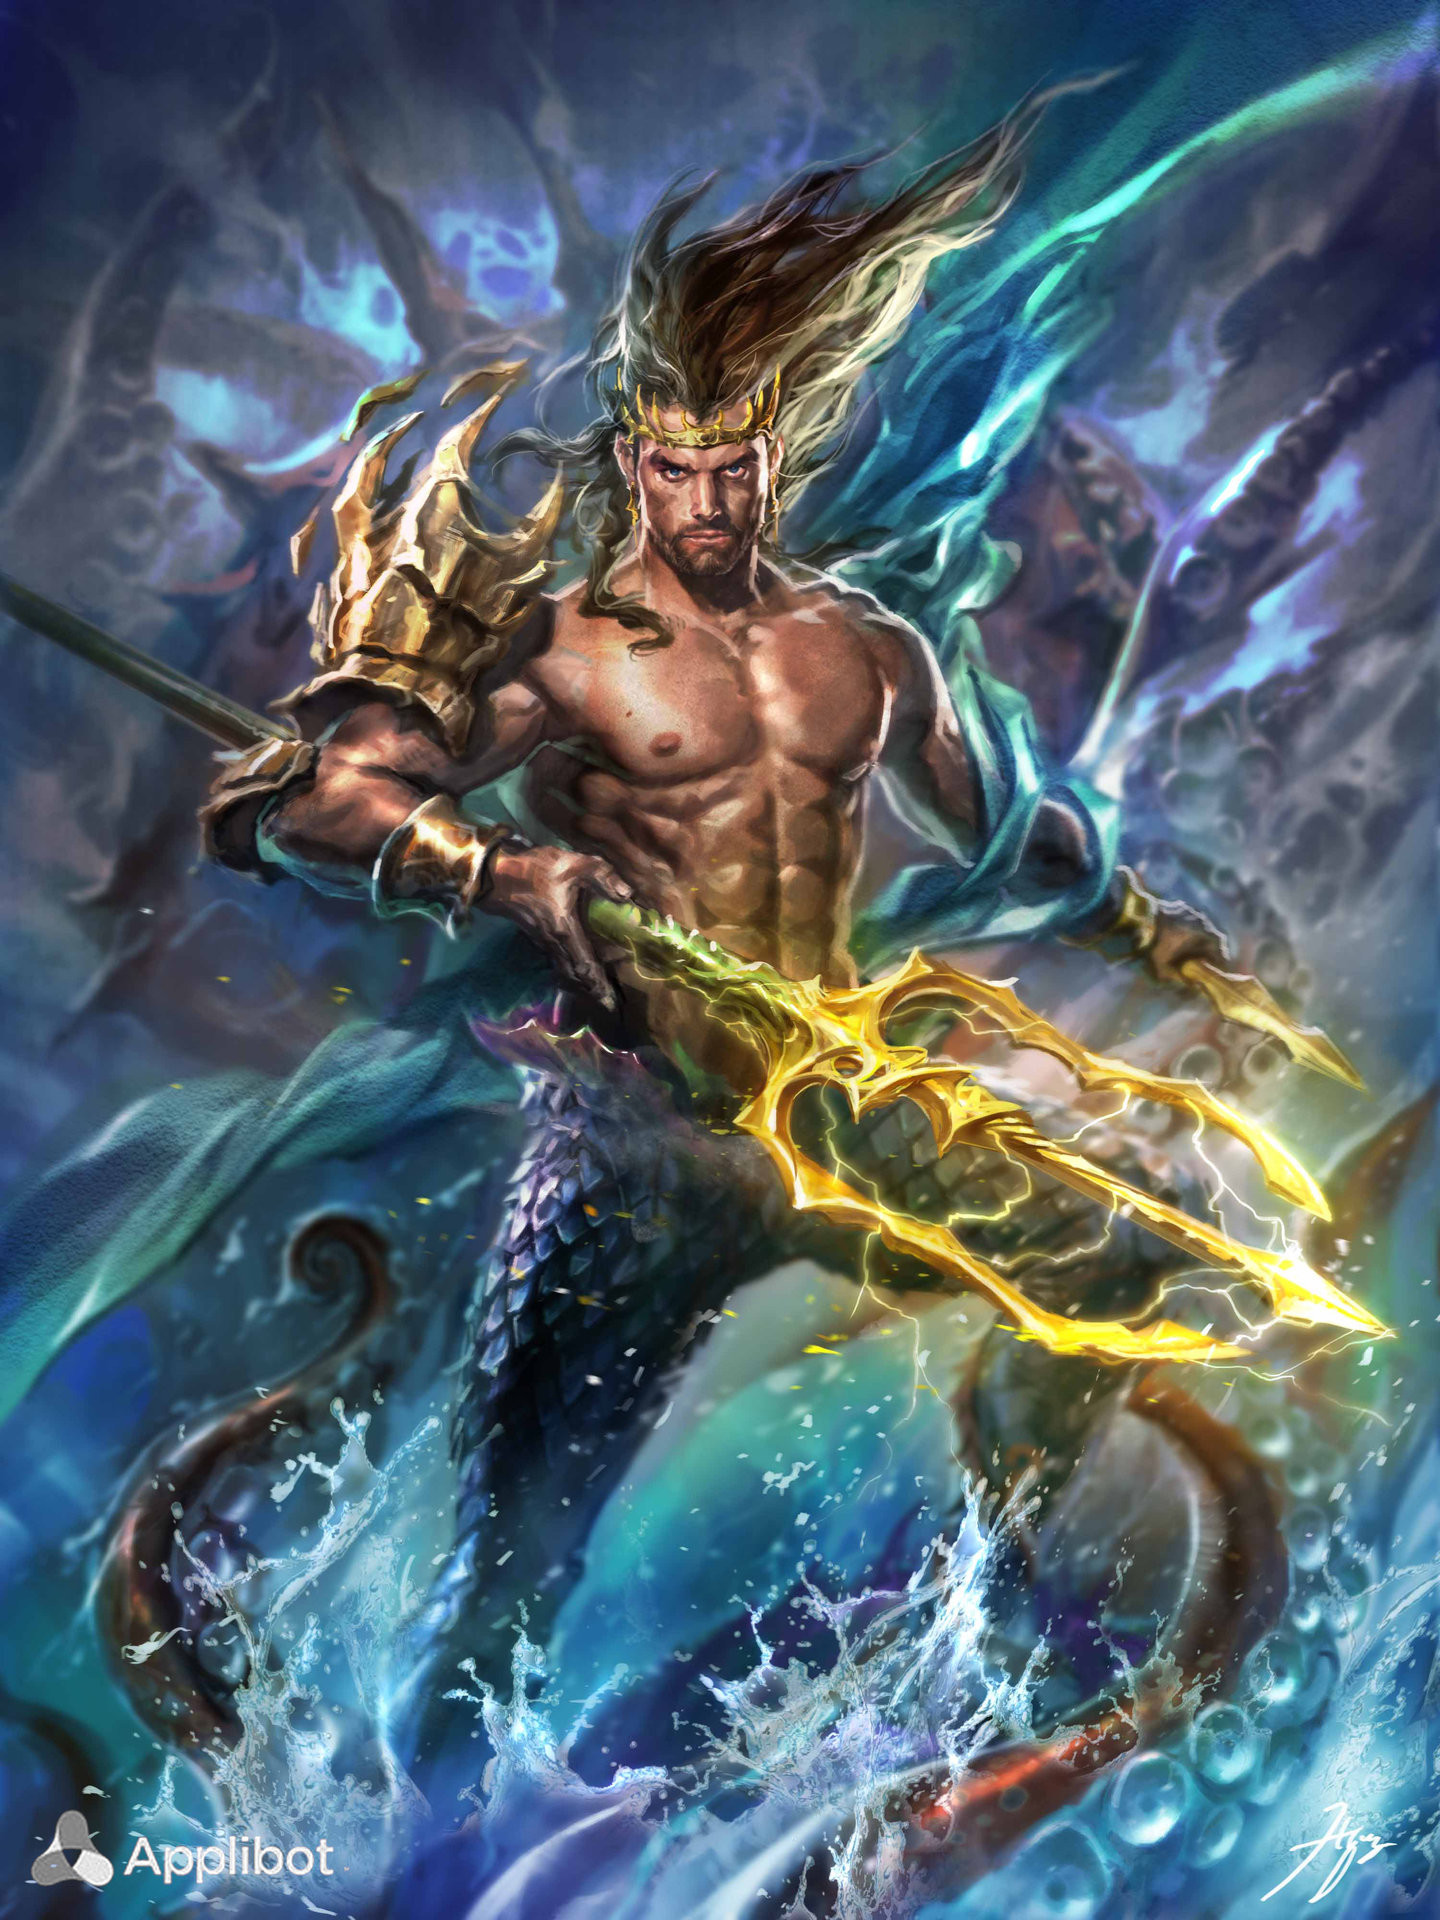 Res: 1440x1920, High Resolution Wallpaper | Poseidon  px